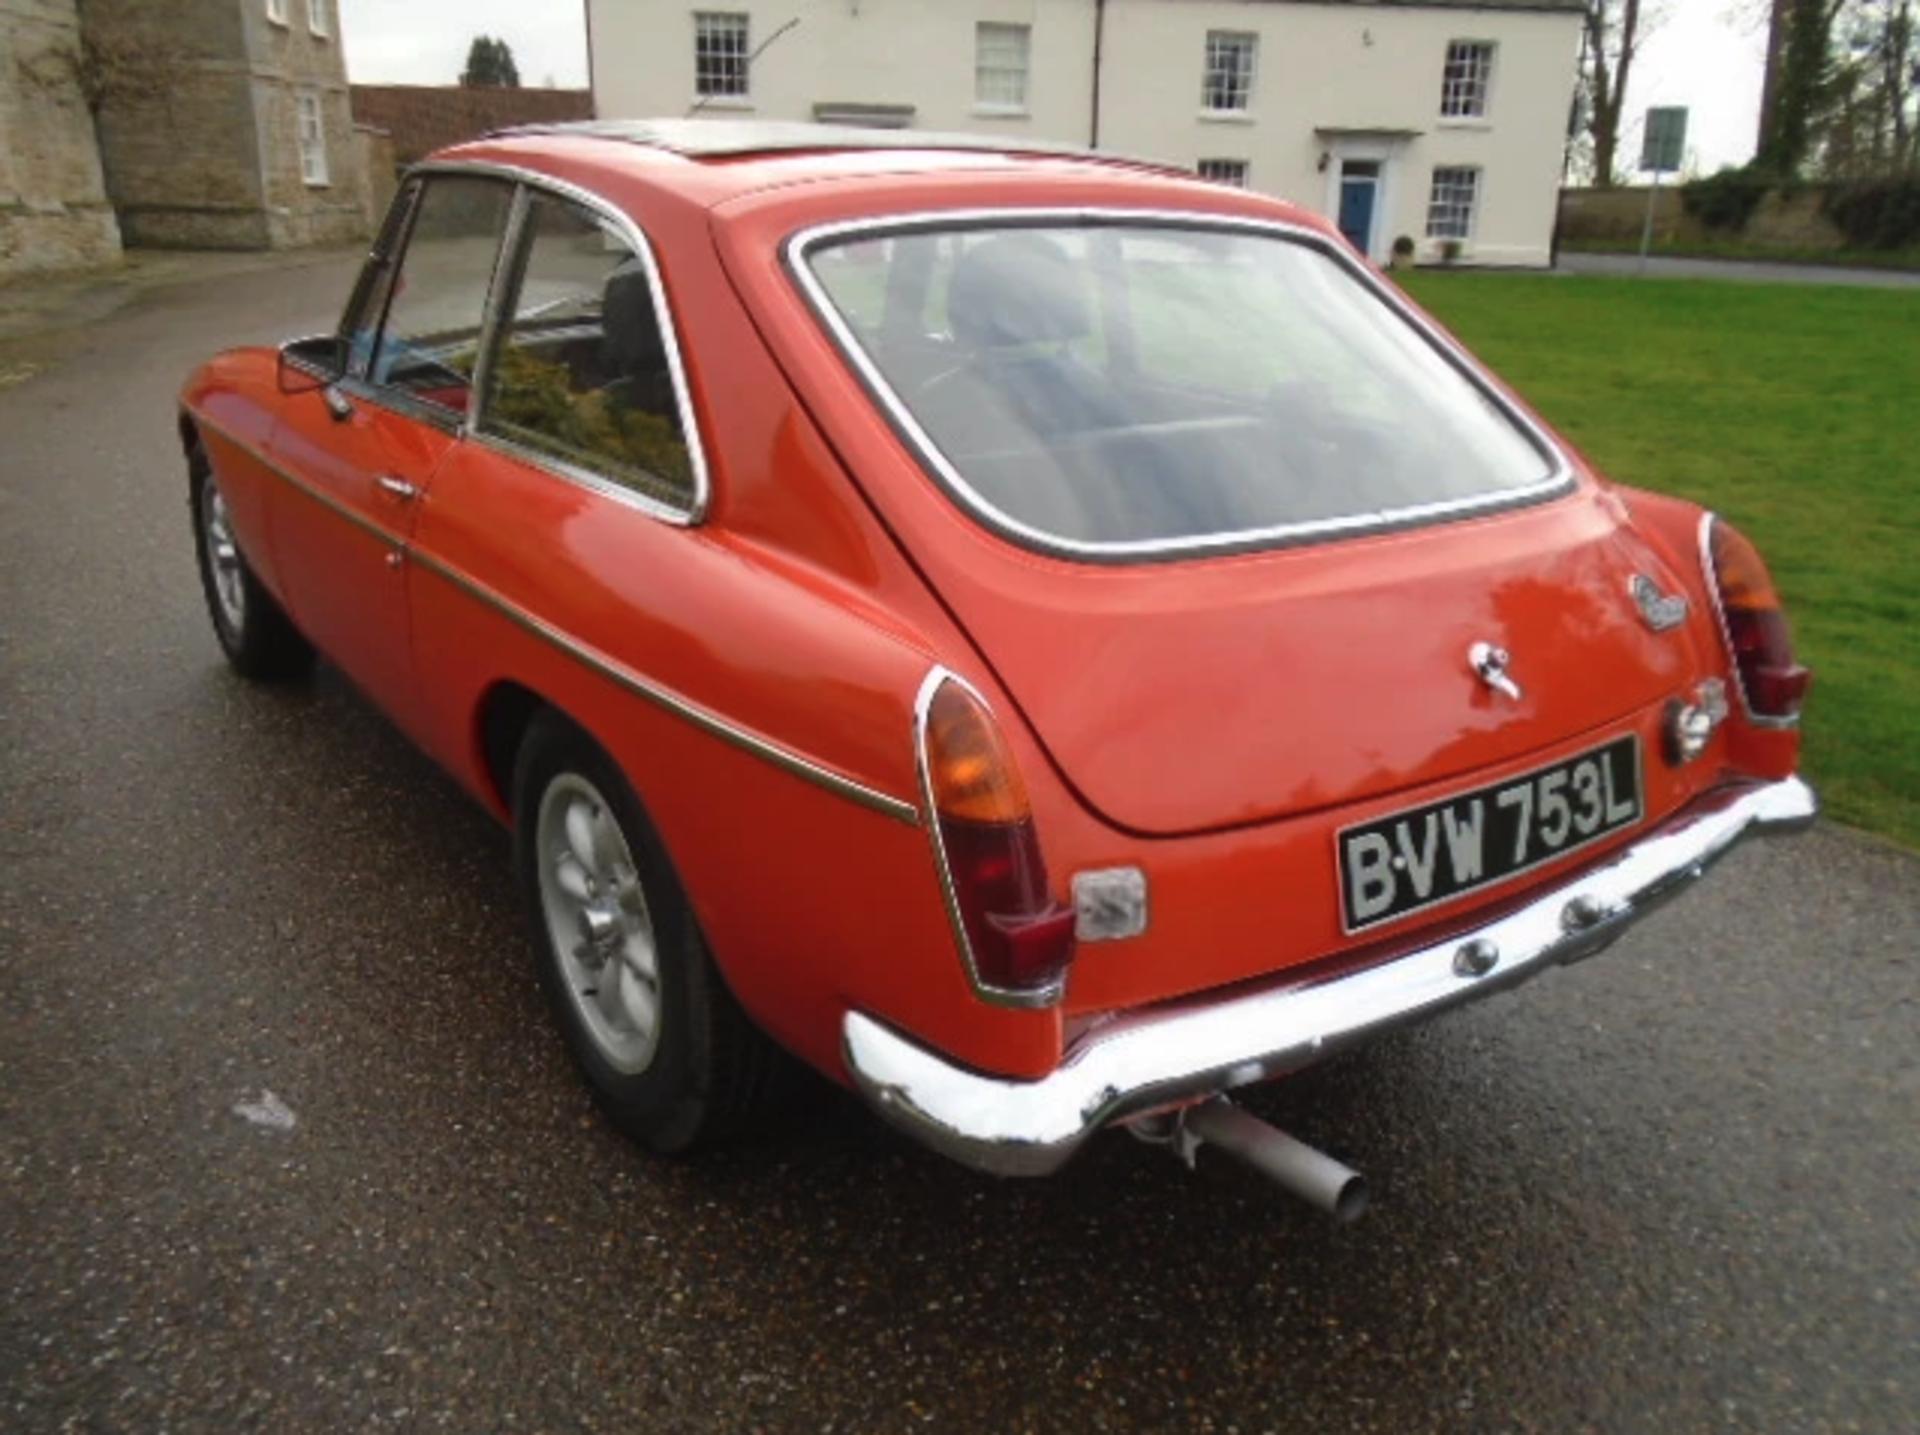 1973 MG B GT - Image 4 of 6